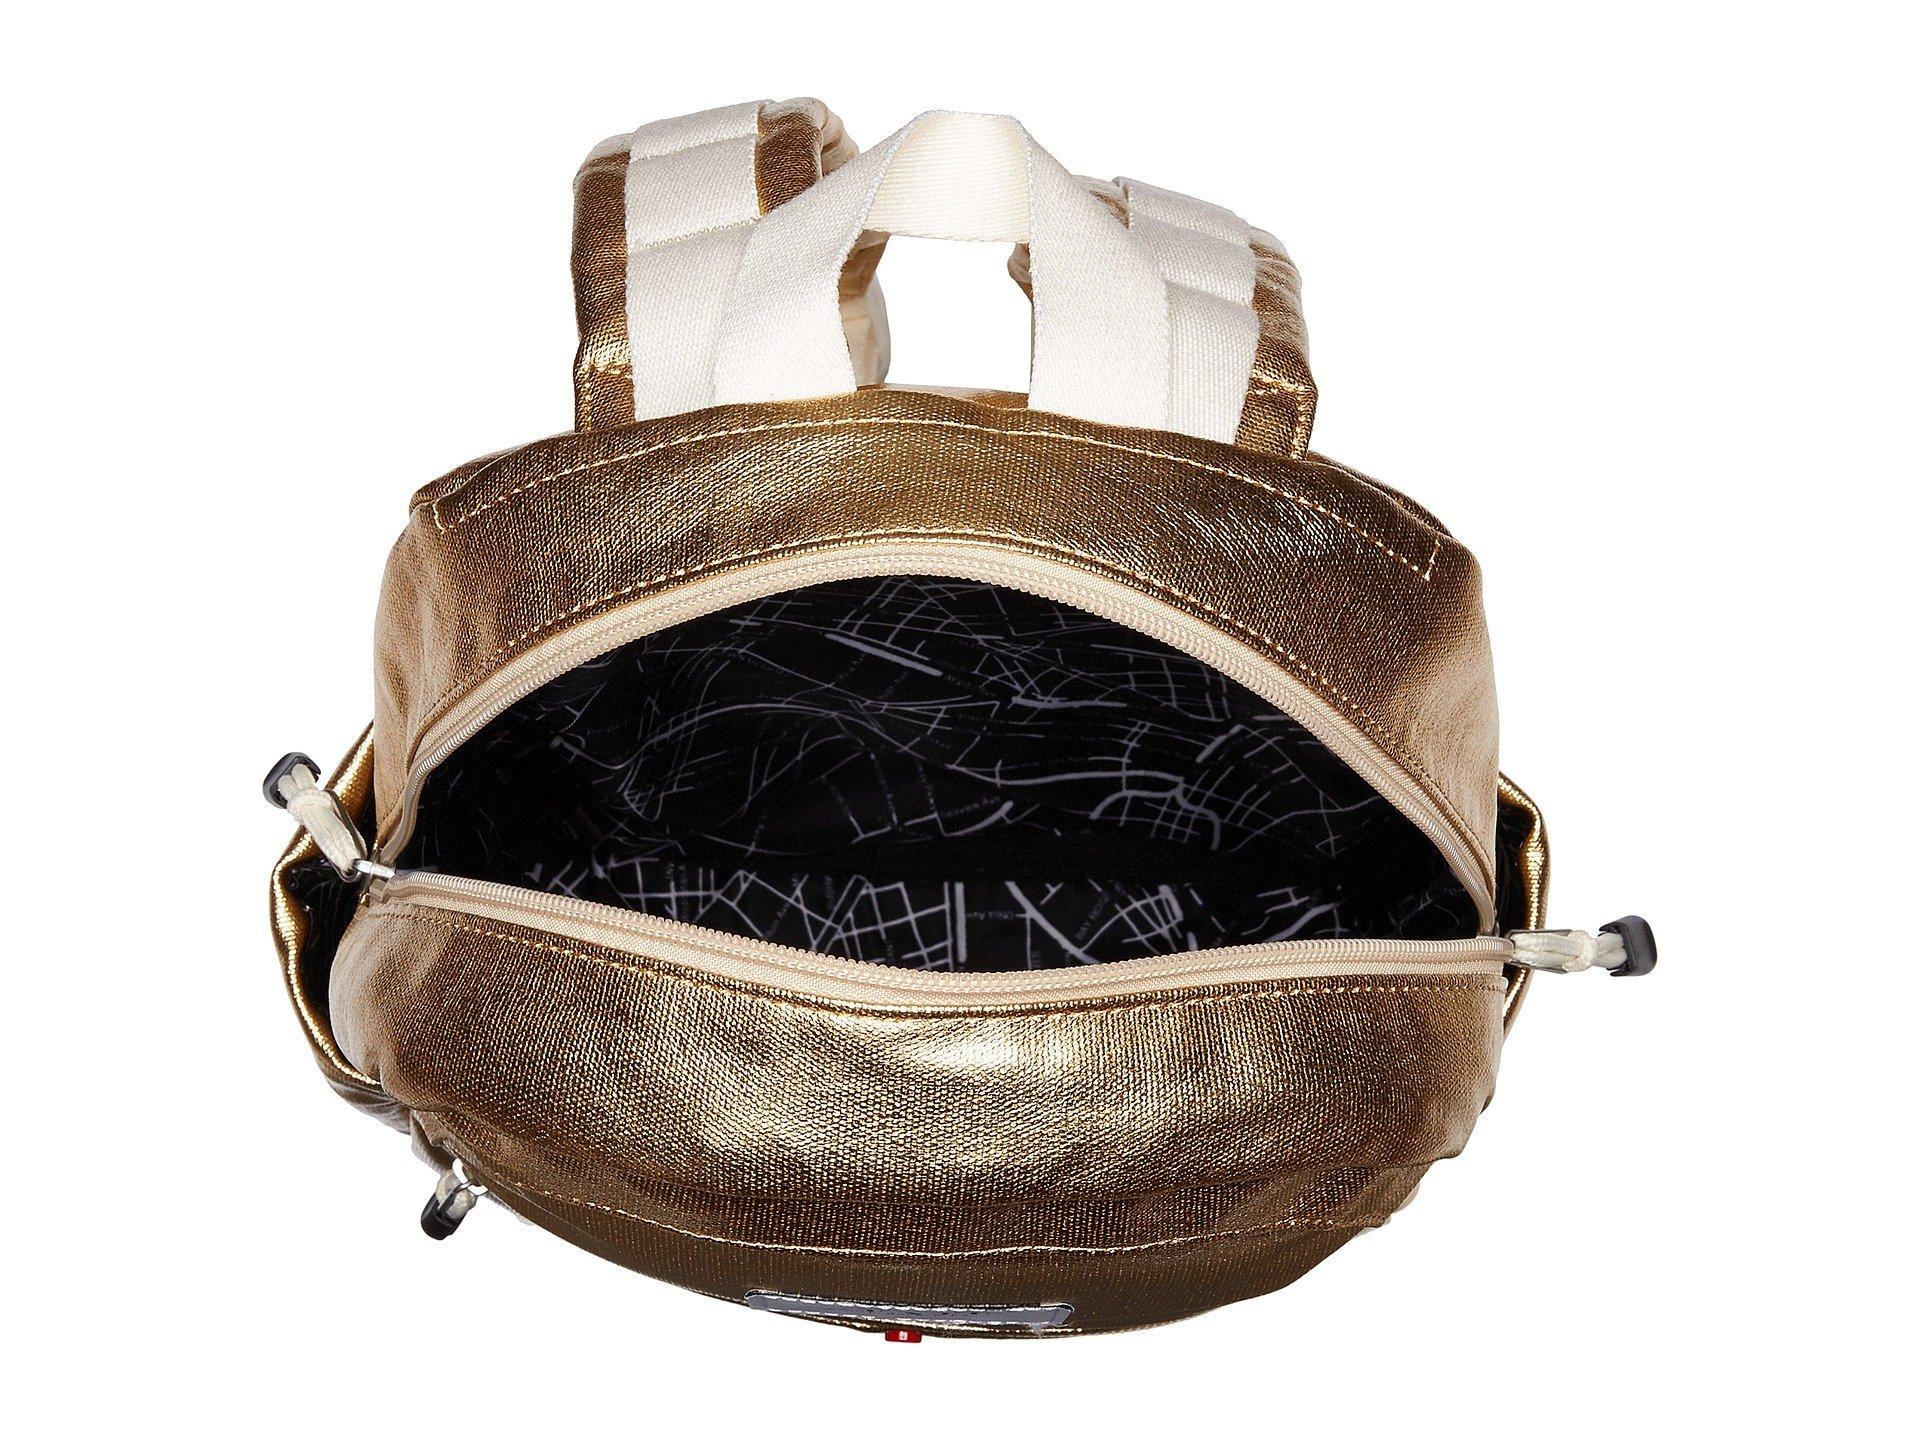 Backpack Bags Mini Gold Kane State Metallic BpRn178